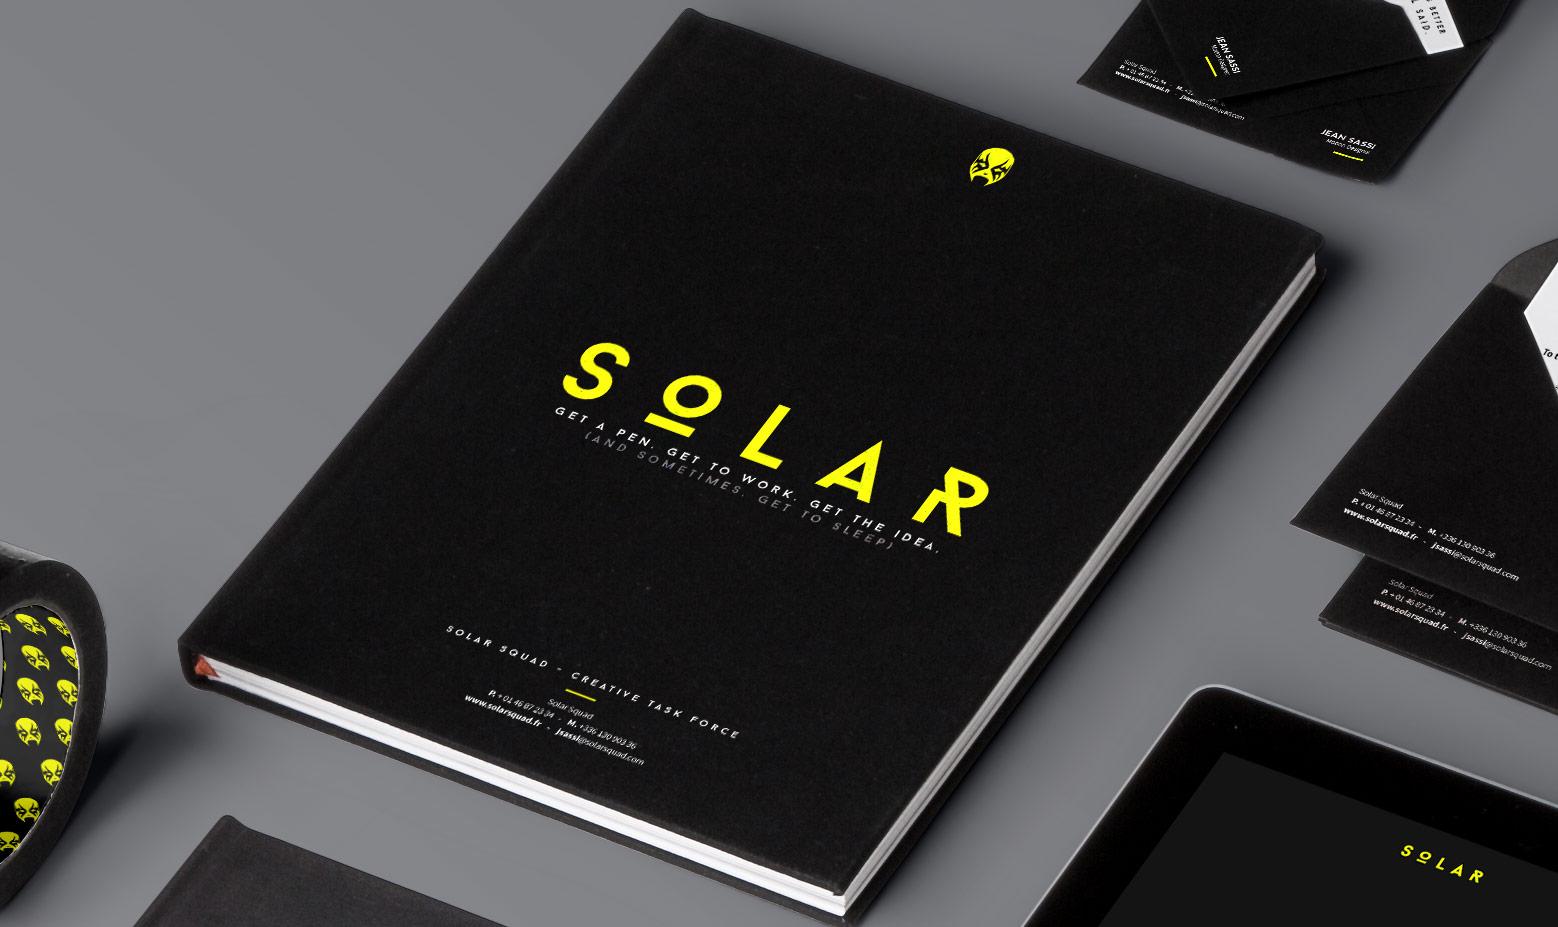 branding-solar-squad-cahier-note-creatif